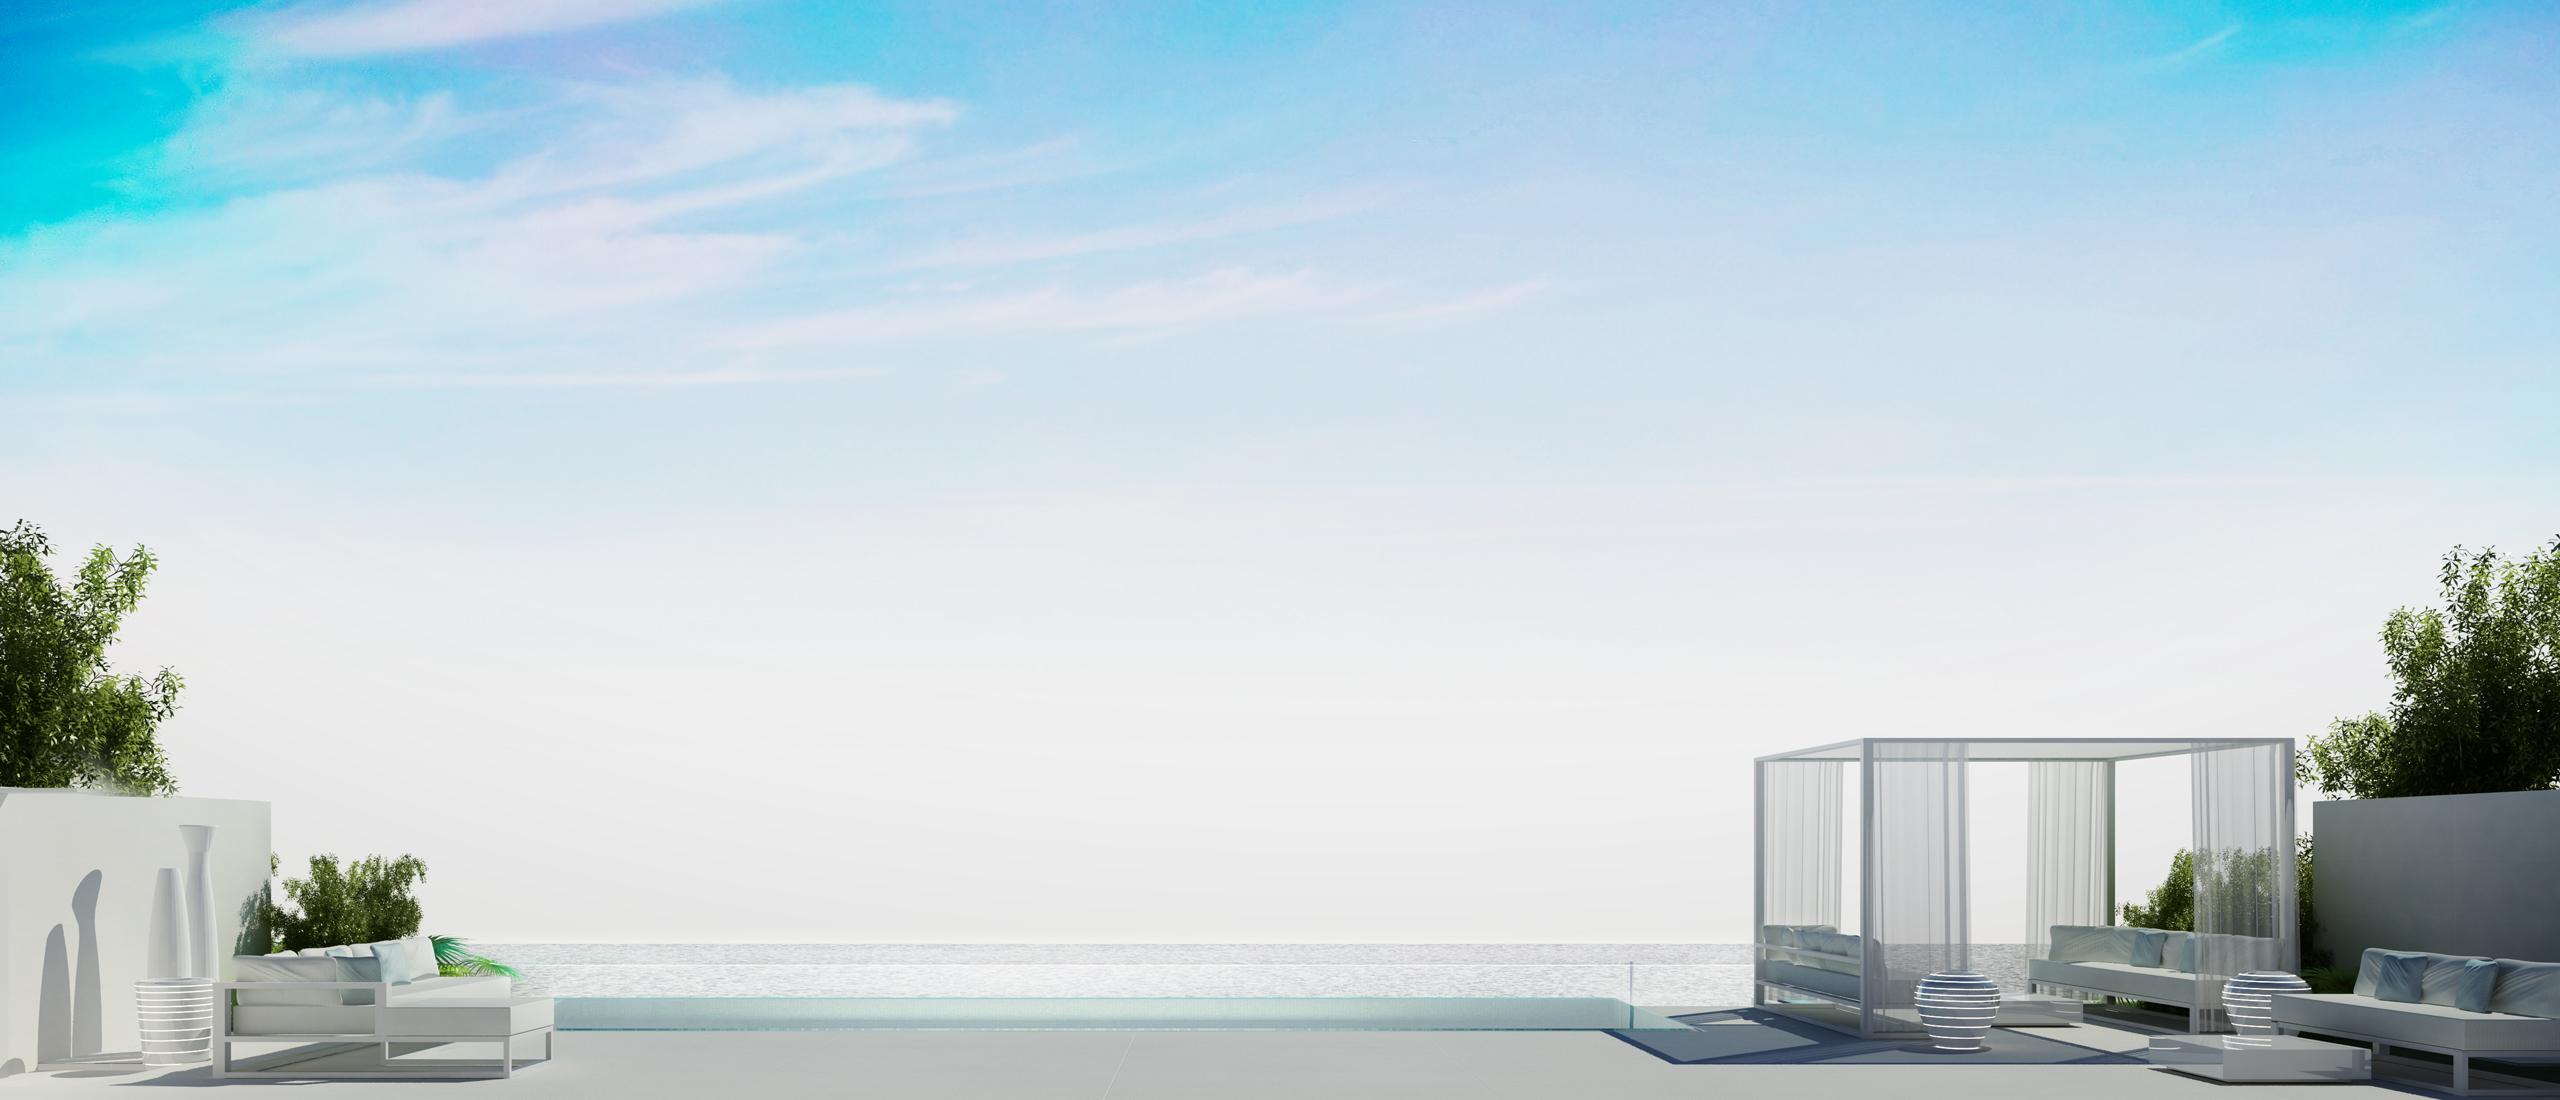 Villa Design with Infinity Pool